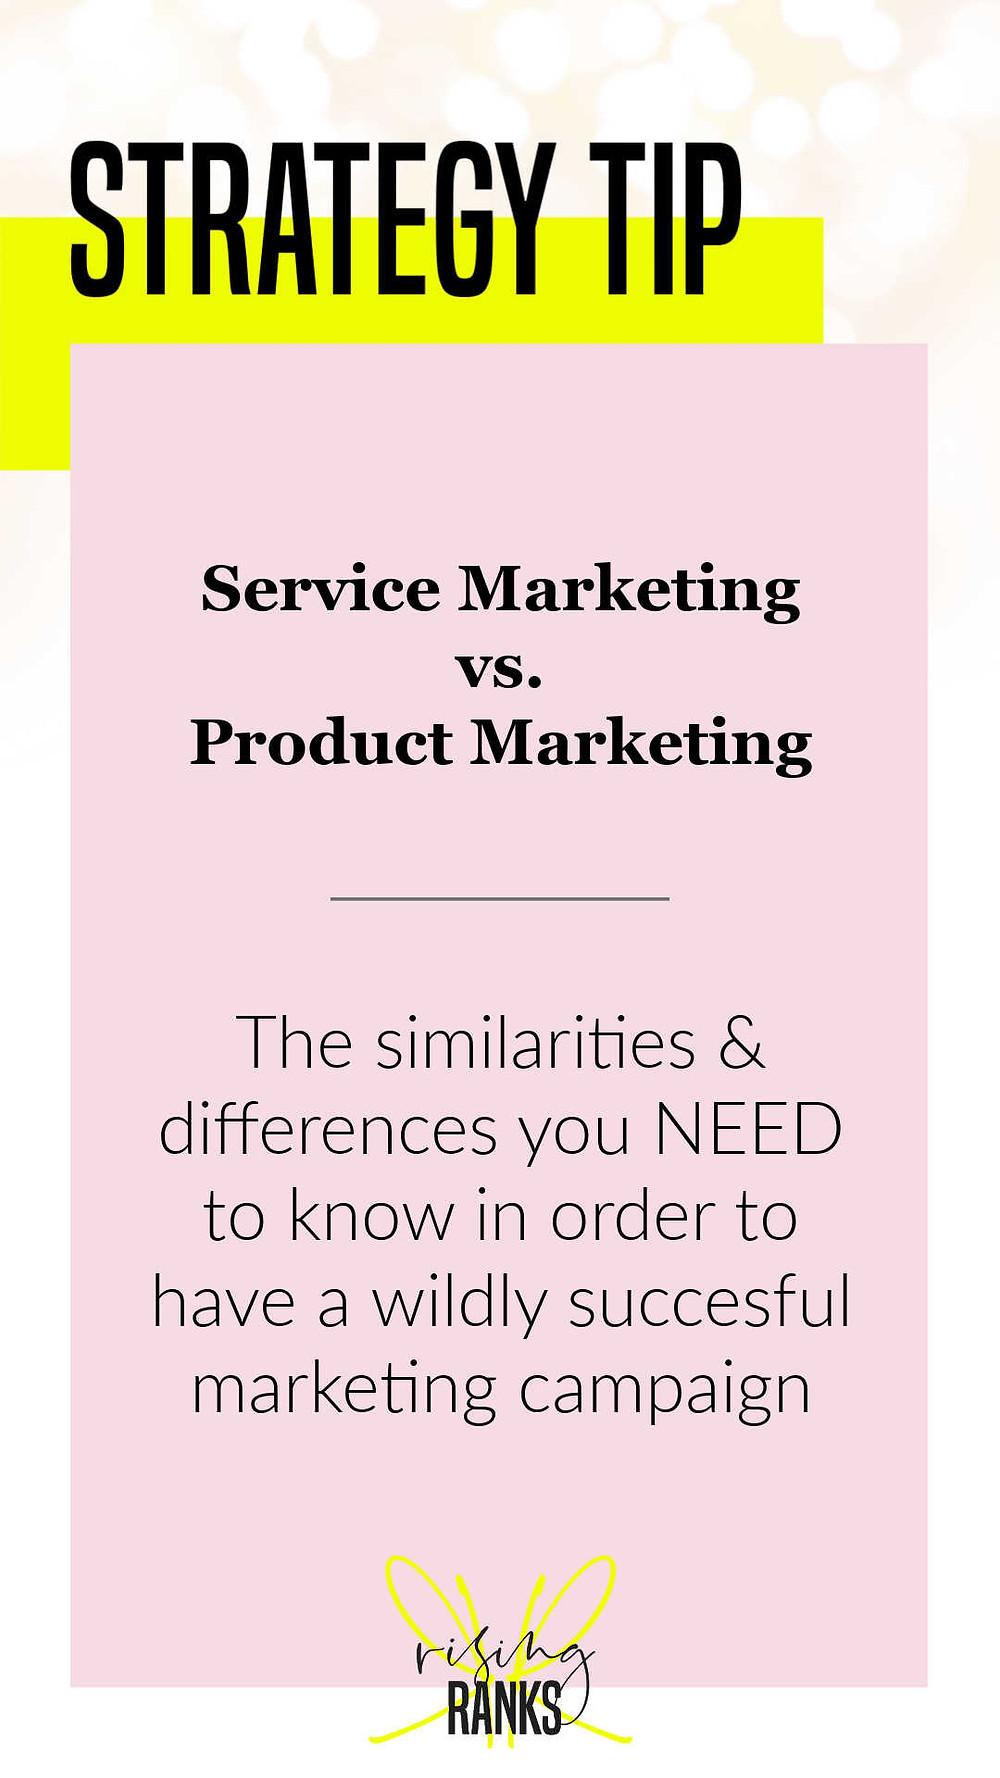 service marketing vs product marketing blog title image